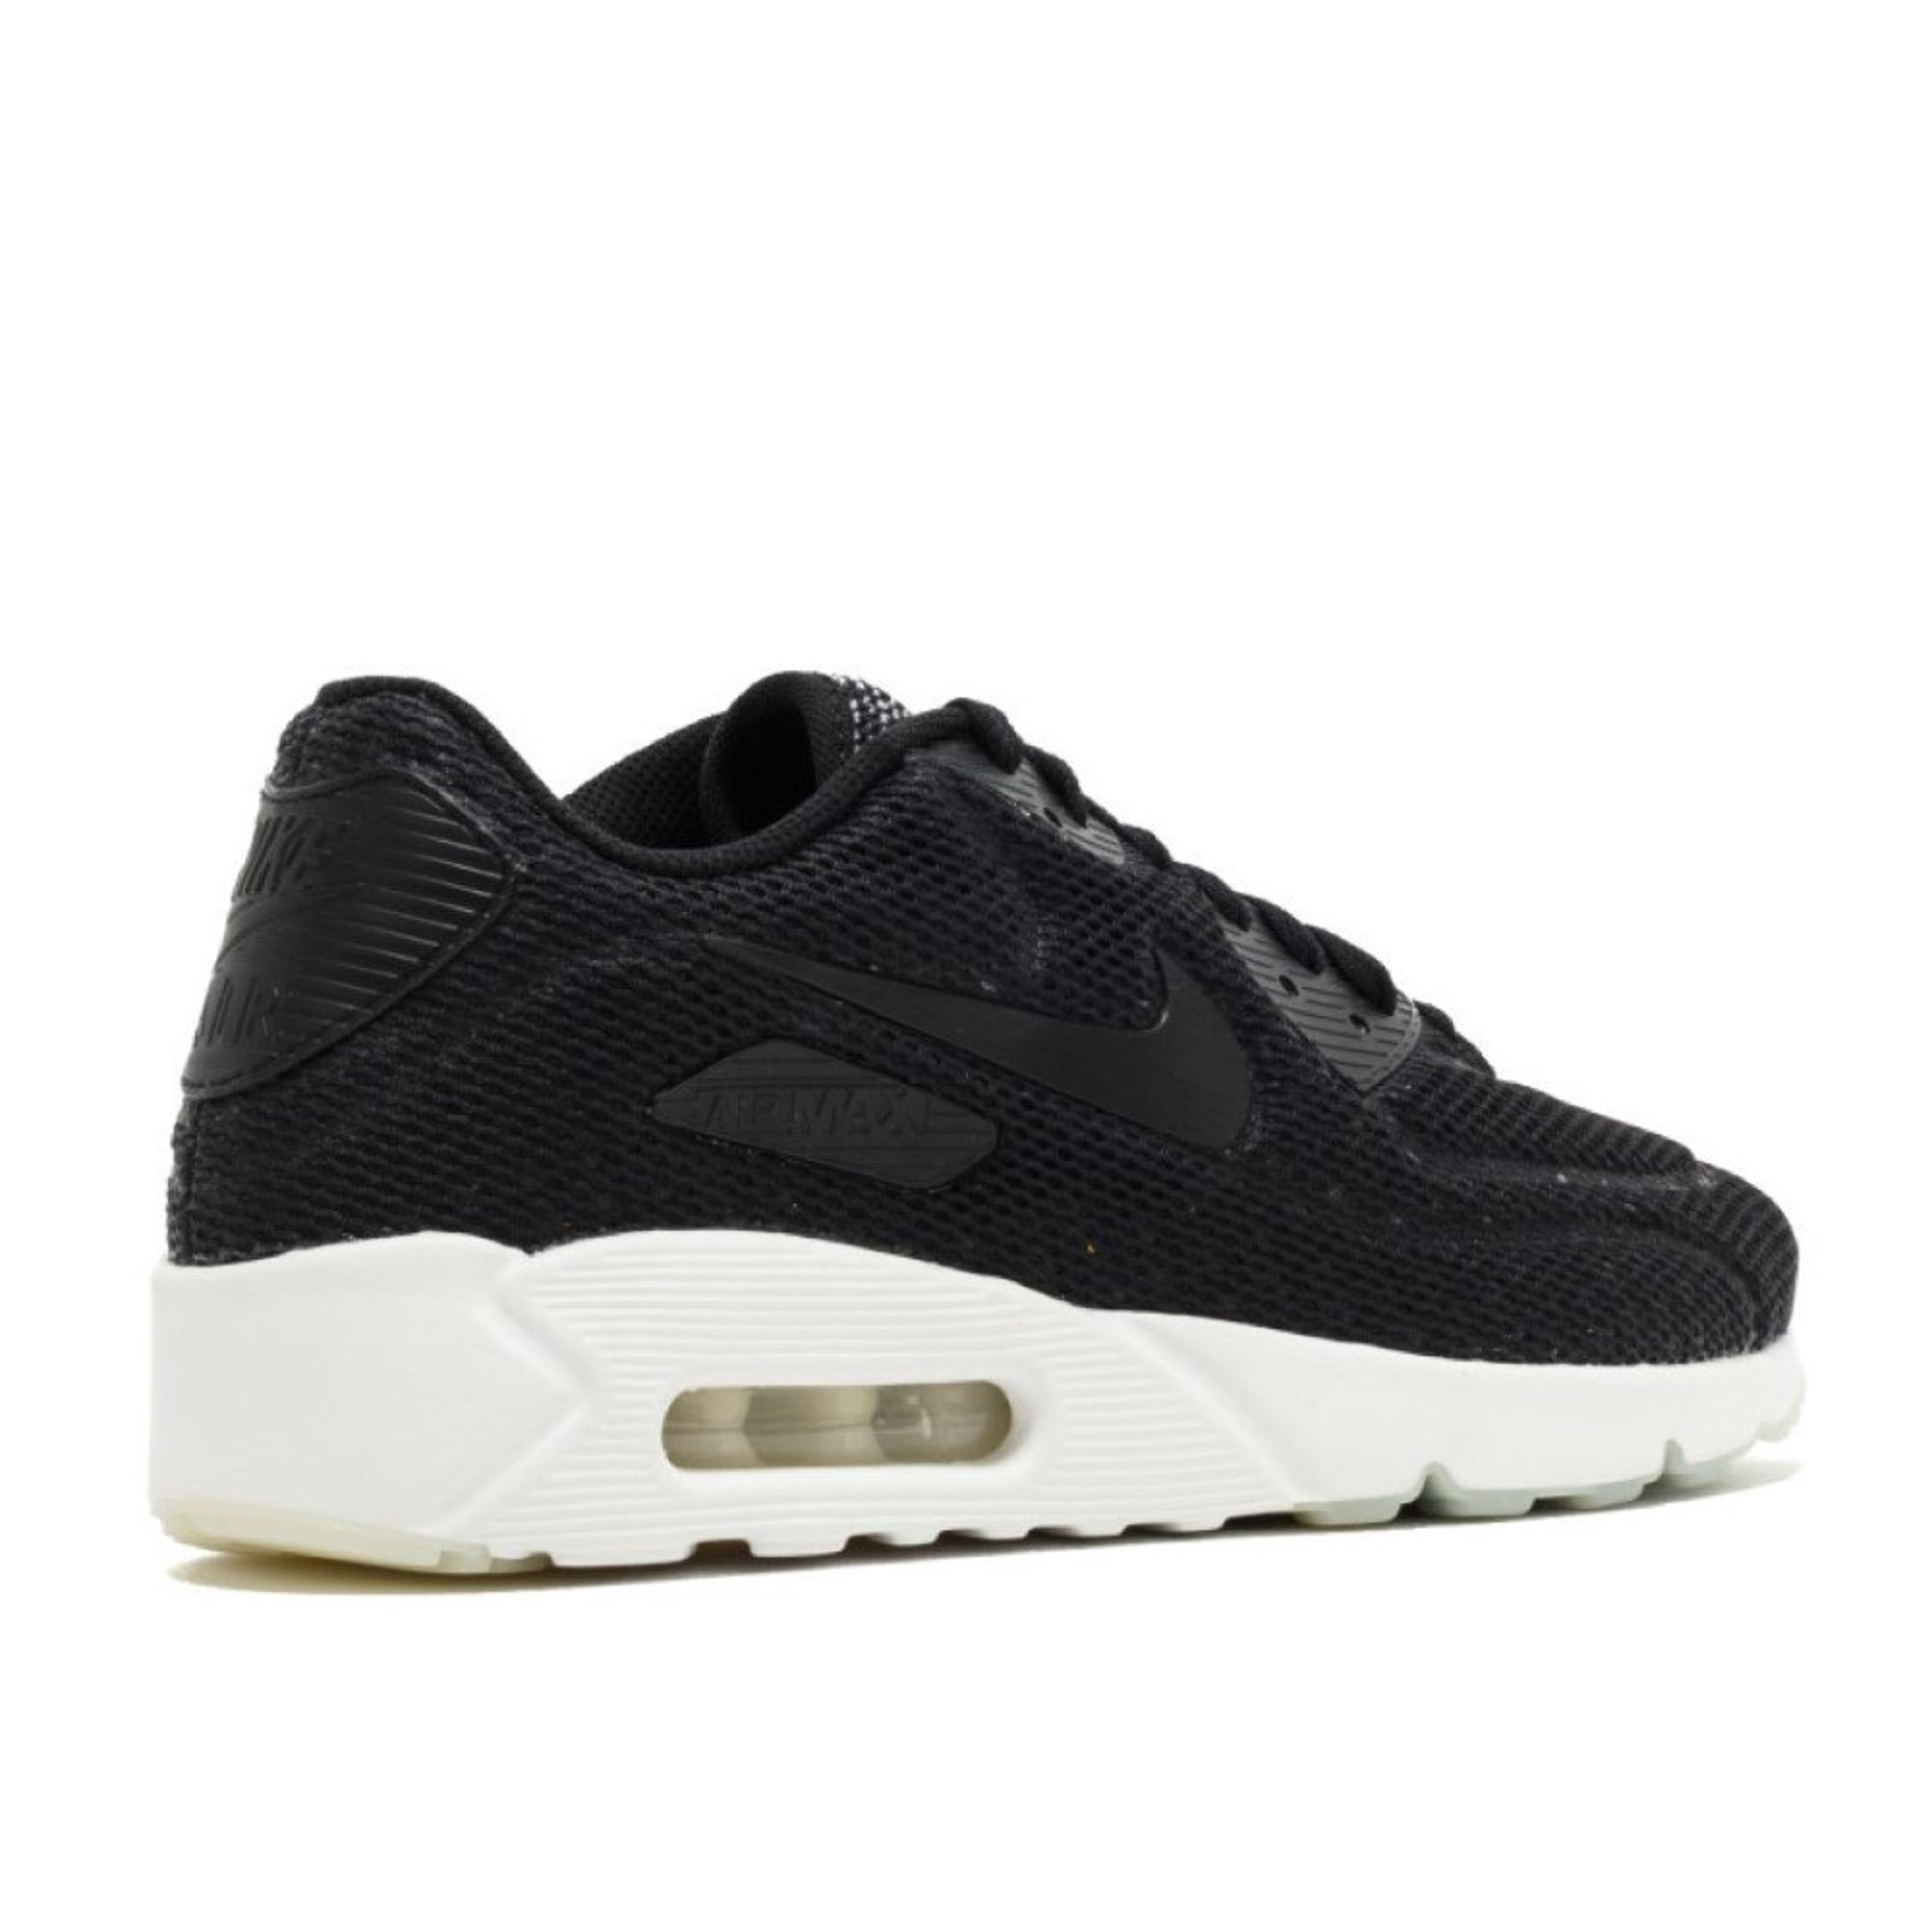 76afd504f4 Nike - Men - Air Max 90 Ultra 2.0 Breathe - 898010-001 - Size 10 | Walmart  Canada